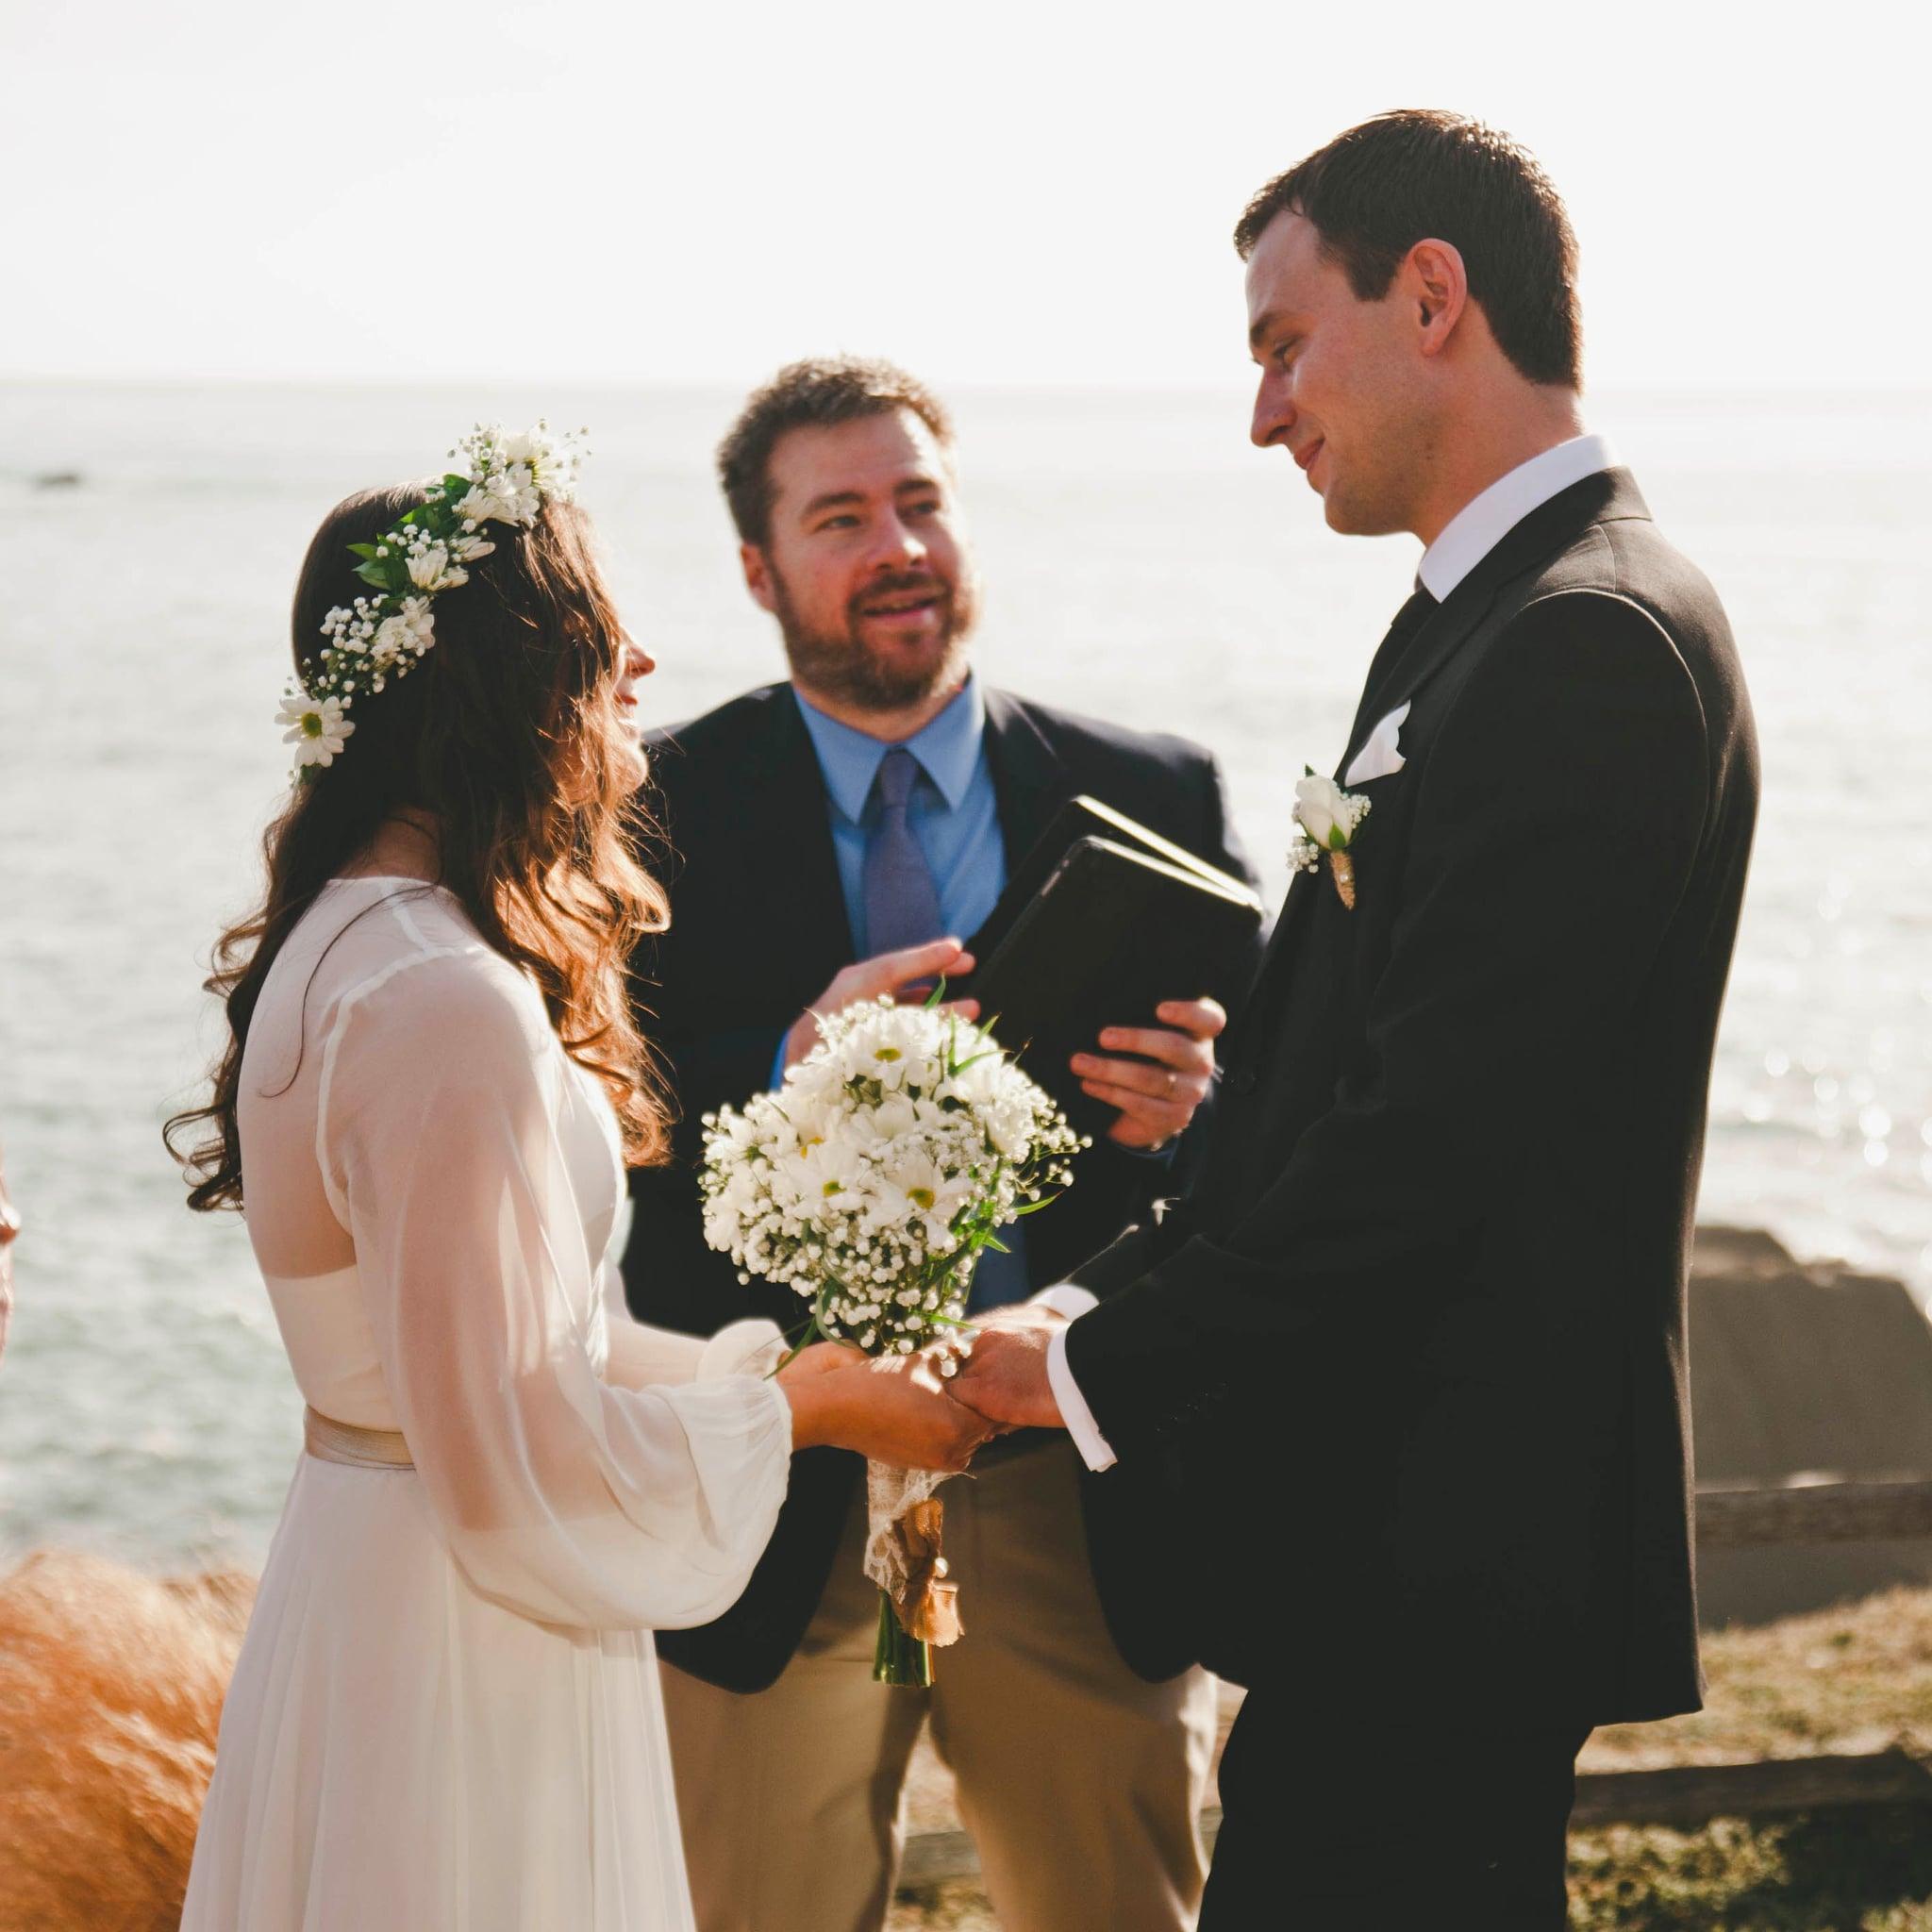 Casual Wedding Ideas   POPSUGAR Love & Sex